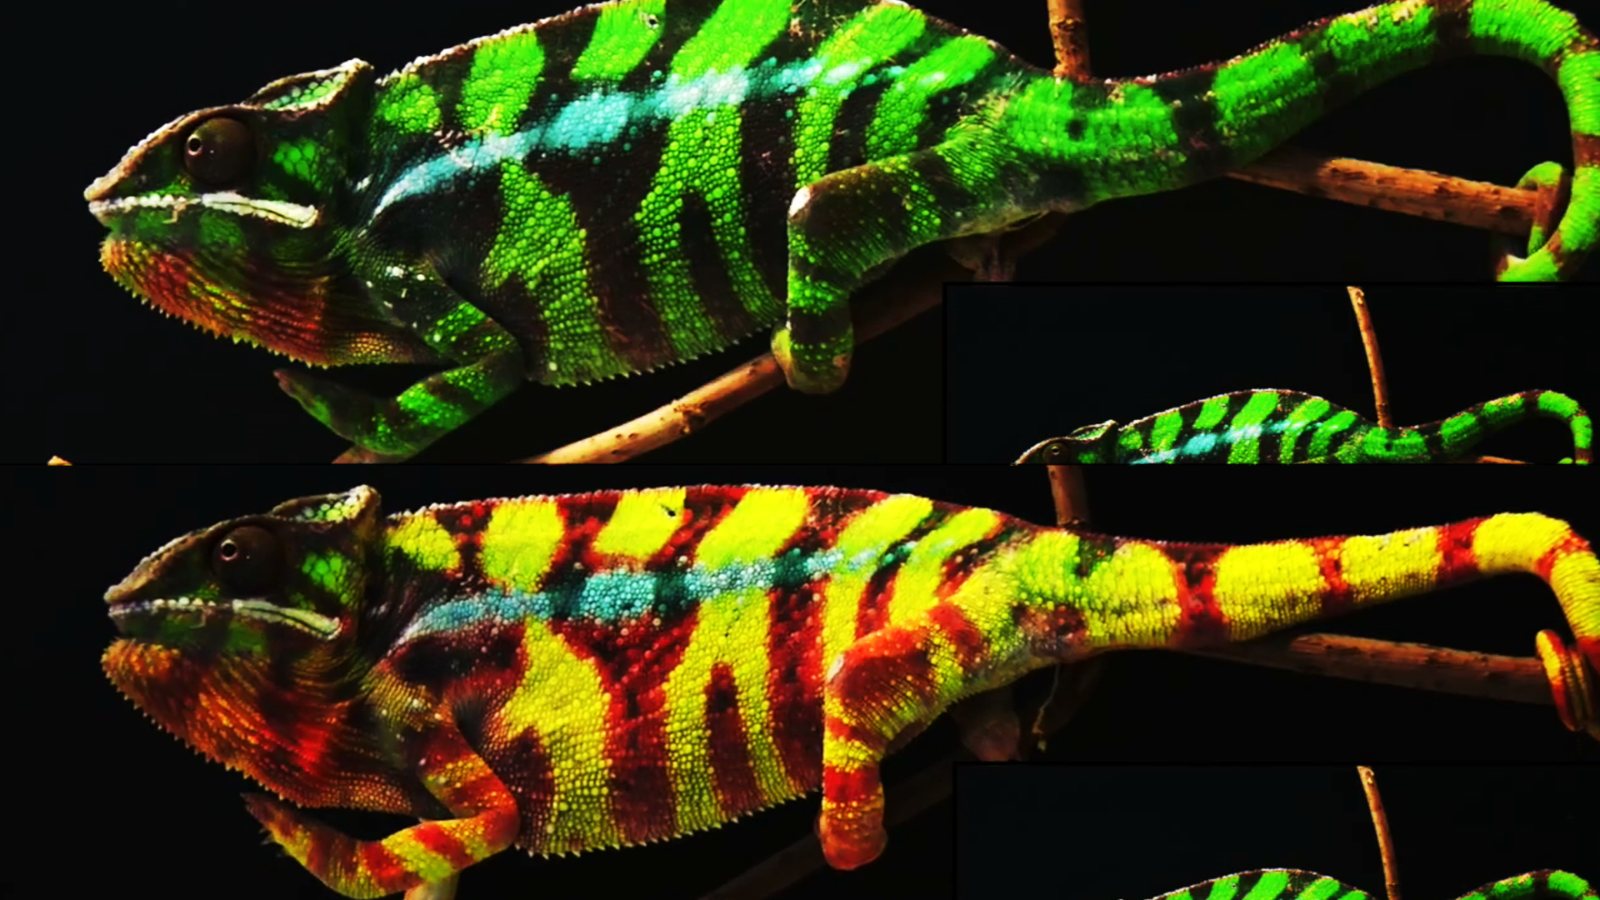 Scientists unlock how chameleons change colors CNN Video